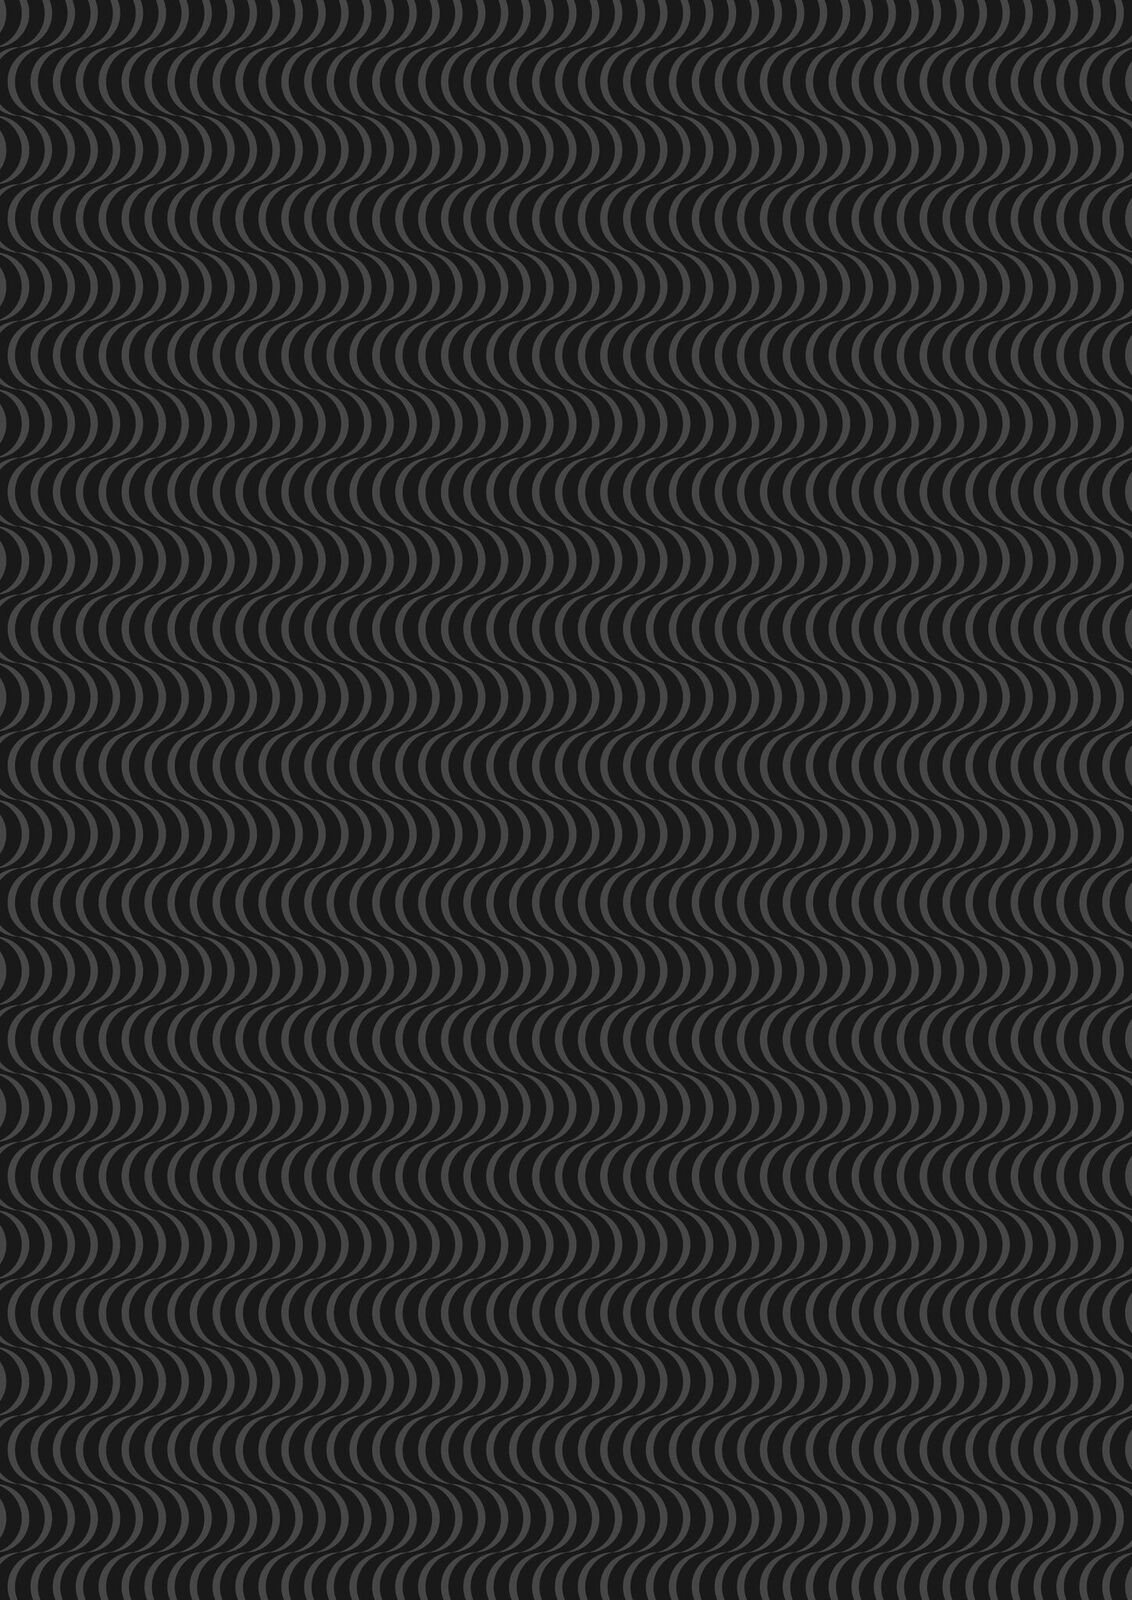 Lewis & Irene Geometrix - Black/Grey with Scallops - GX3.5